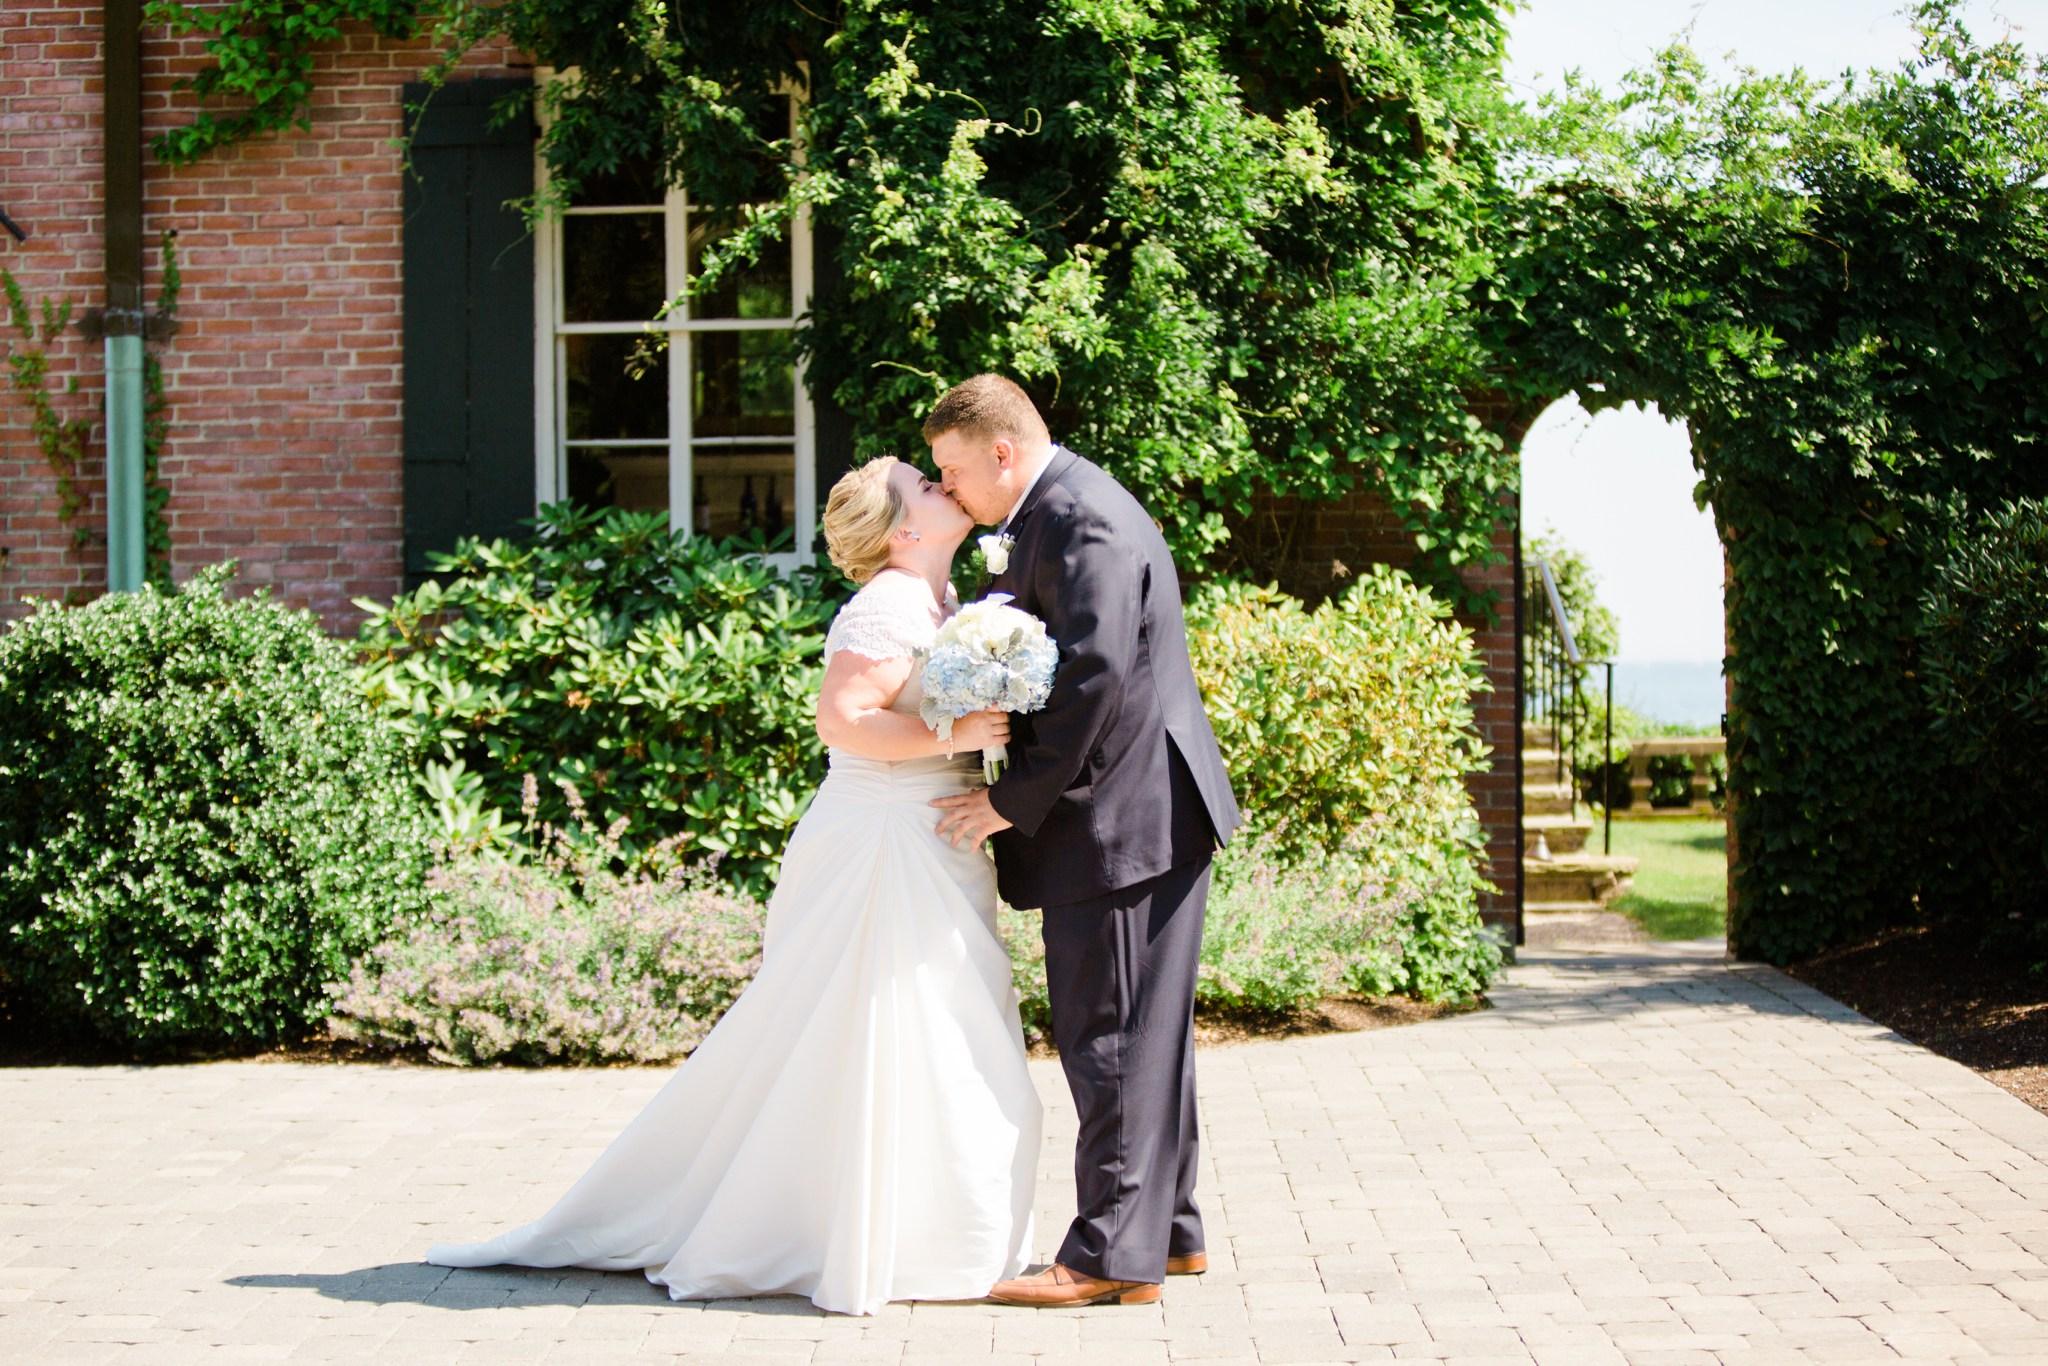 misselwood_endicott_college_wedding_photos_00023.JPG